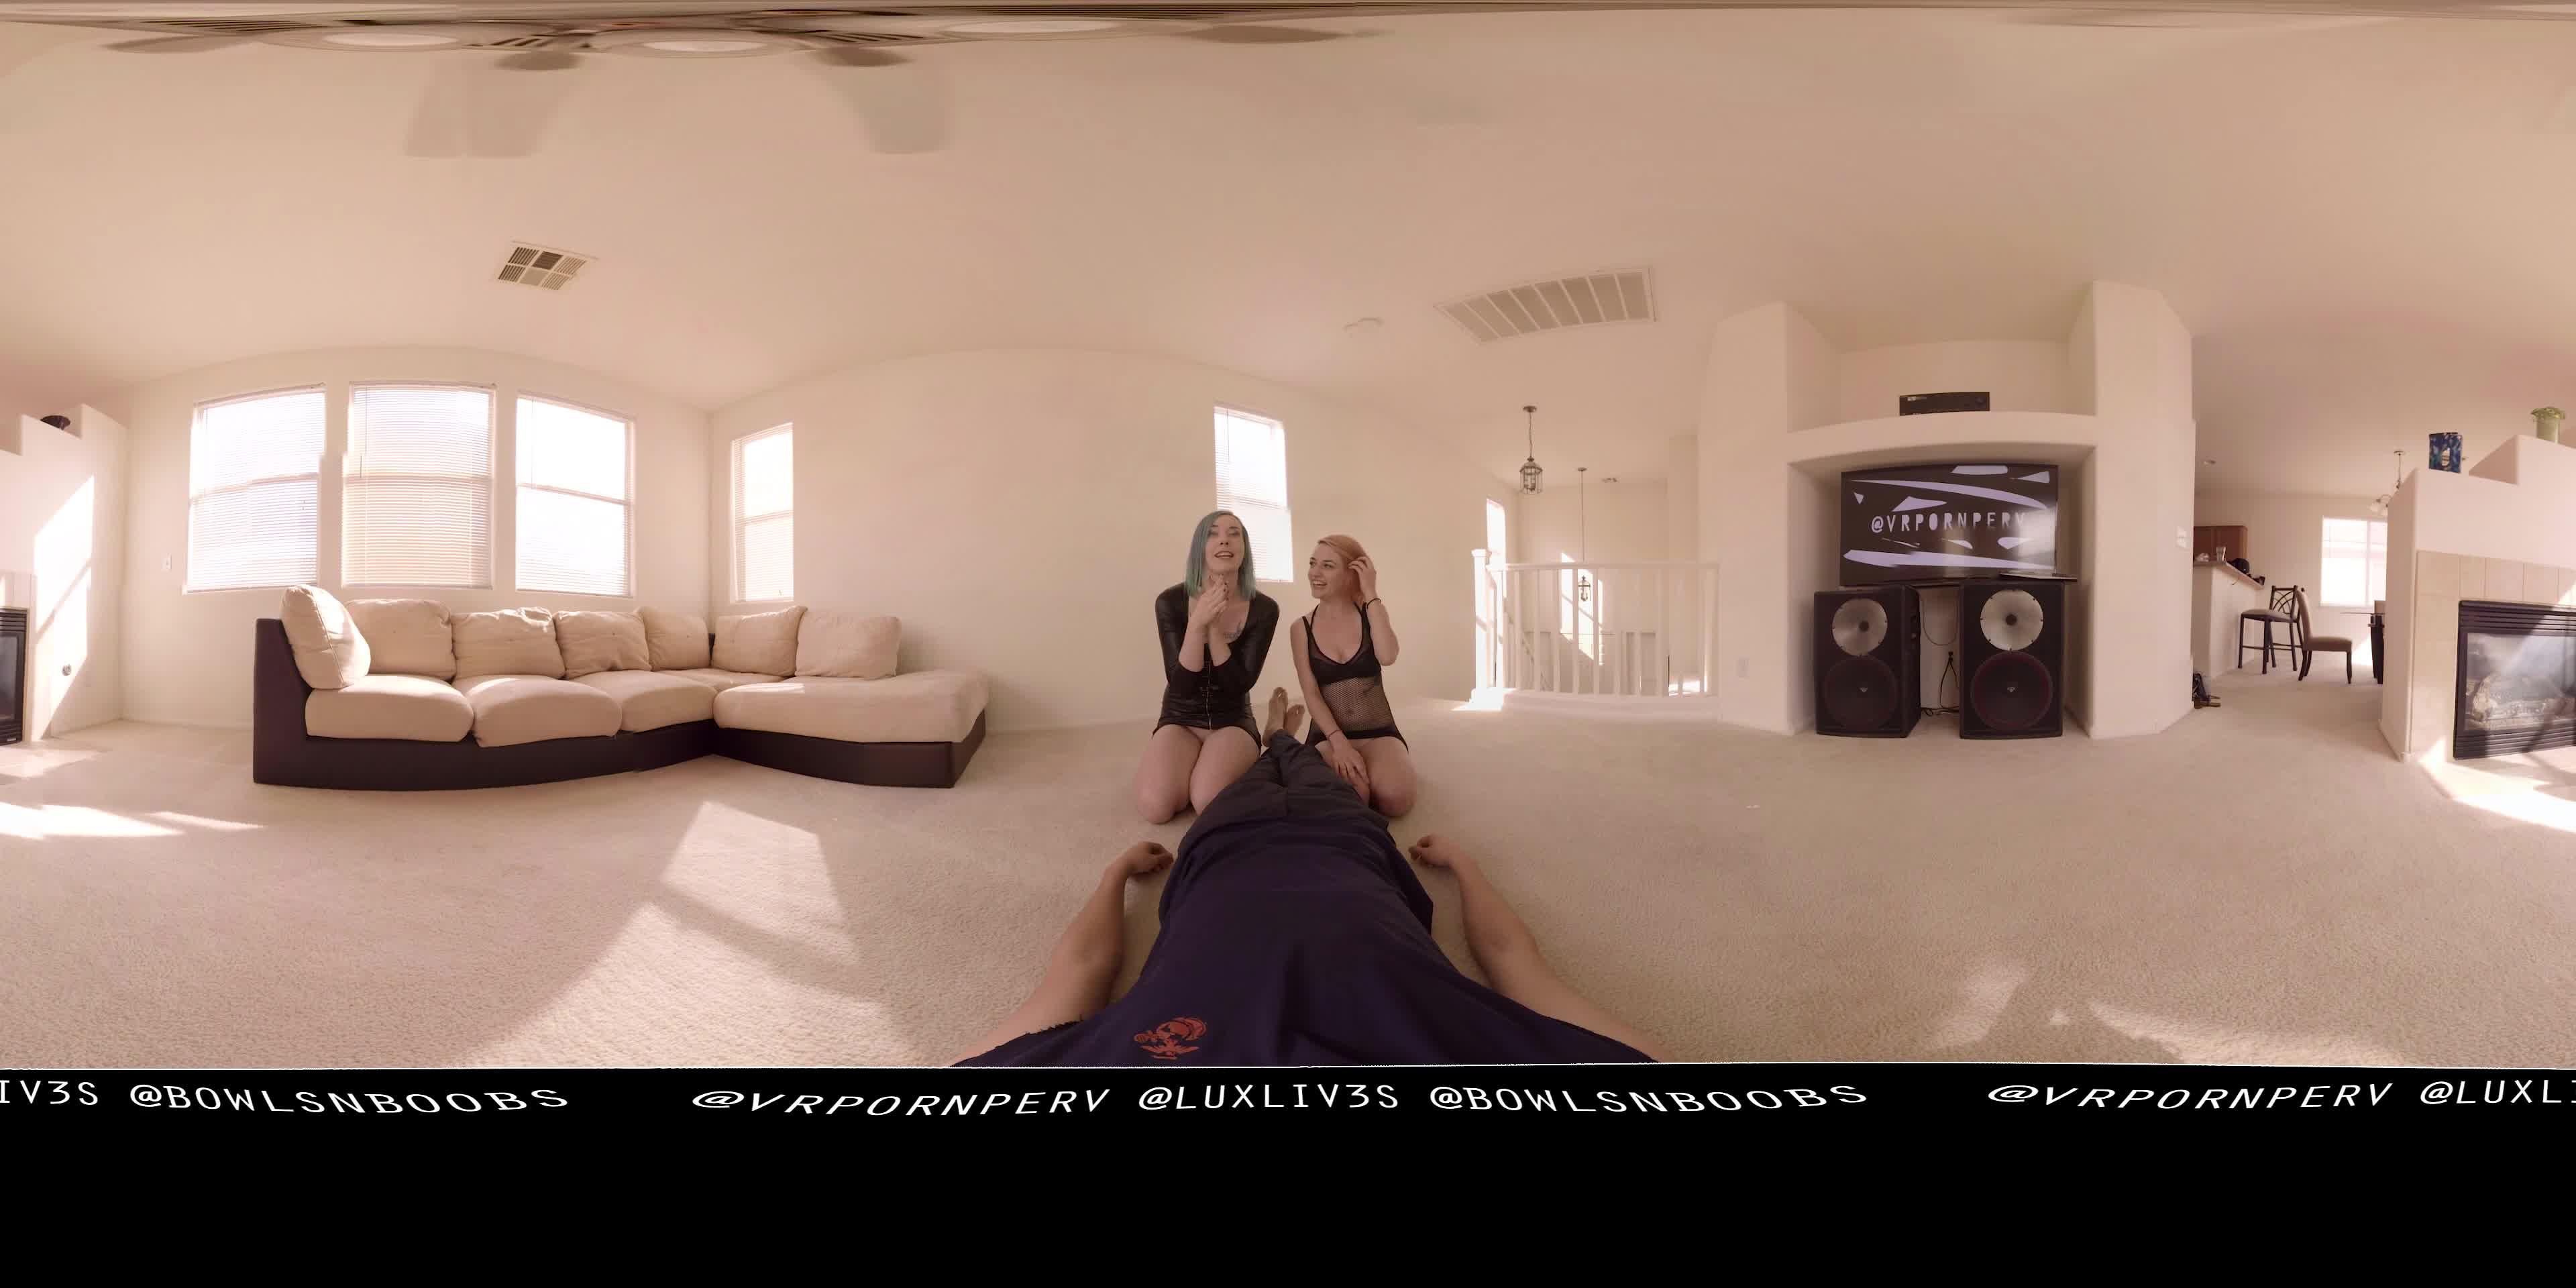 Porn Eating On Floor vr porn perv - vr360 two girls help u eat your cum - manyvids